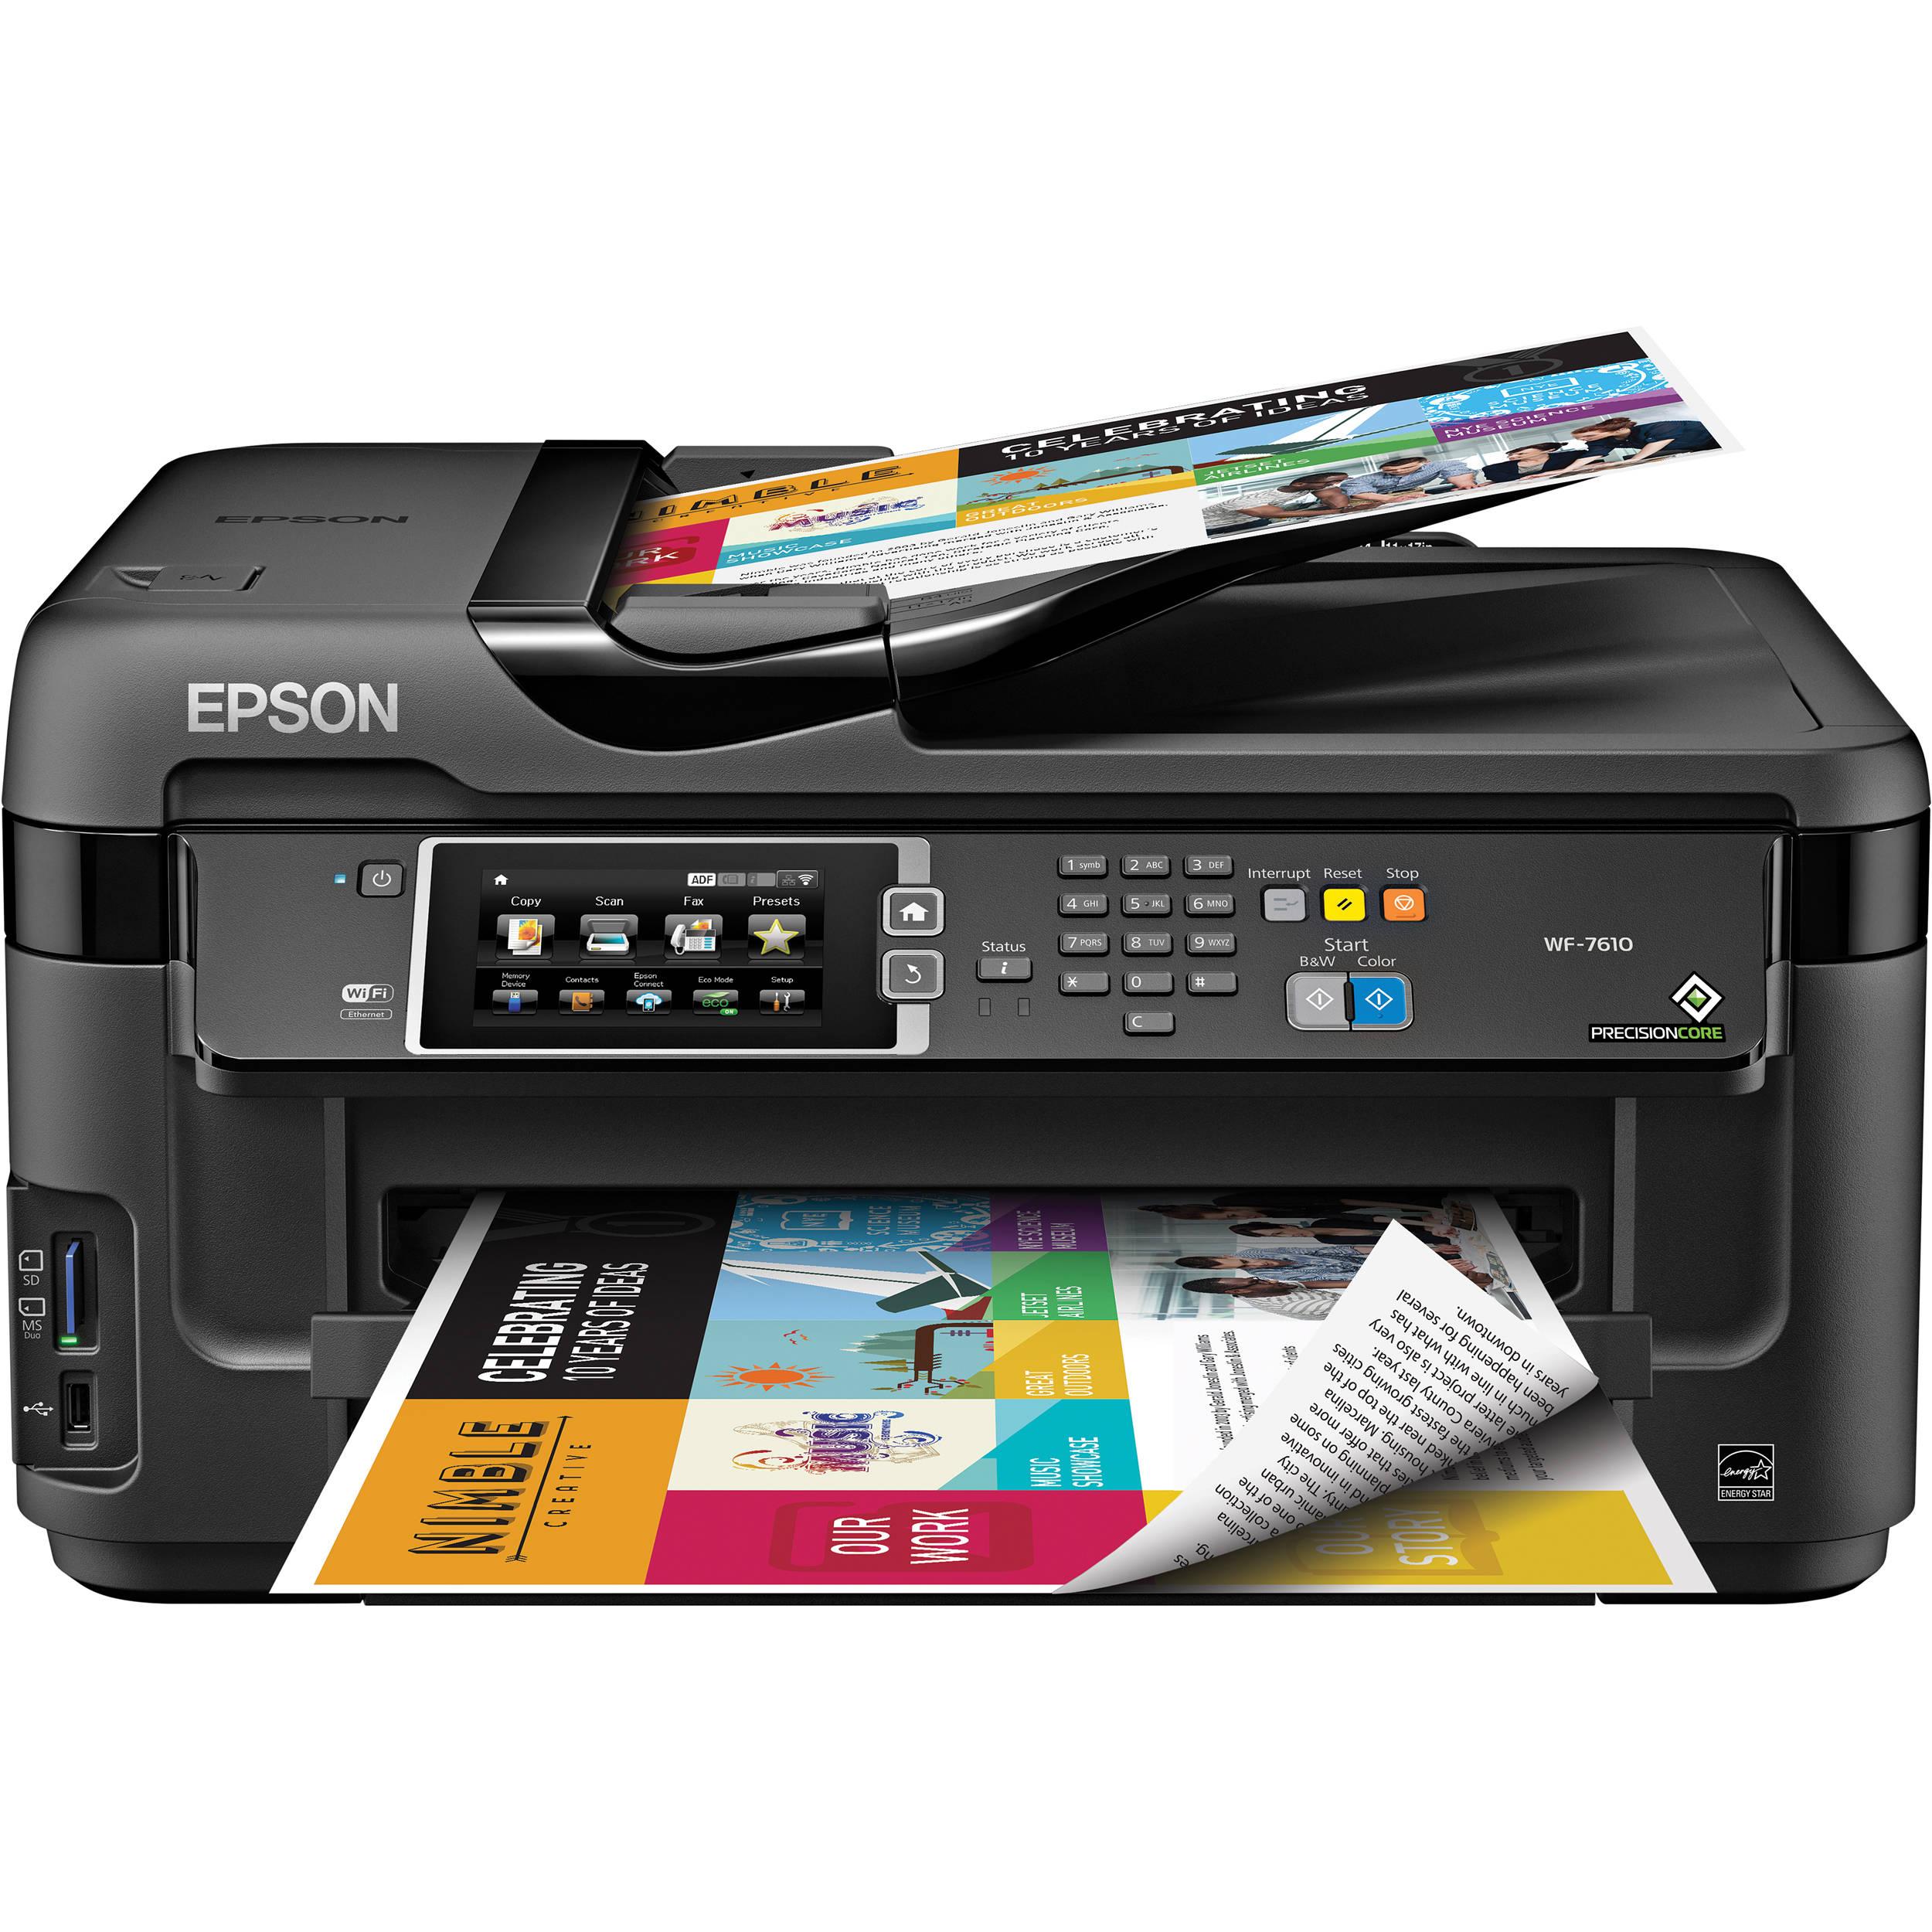 Epson Workforce Wf 7610 All In One Printer Inkjet